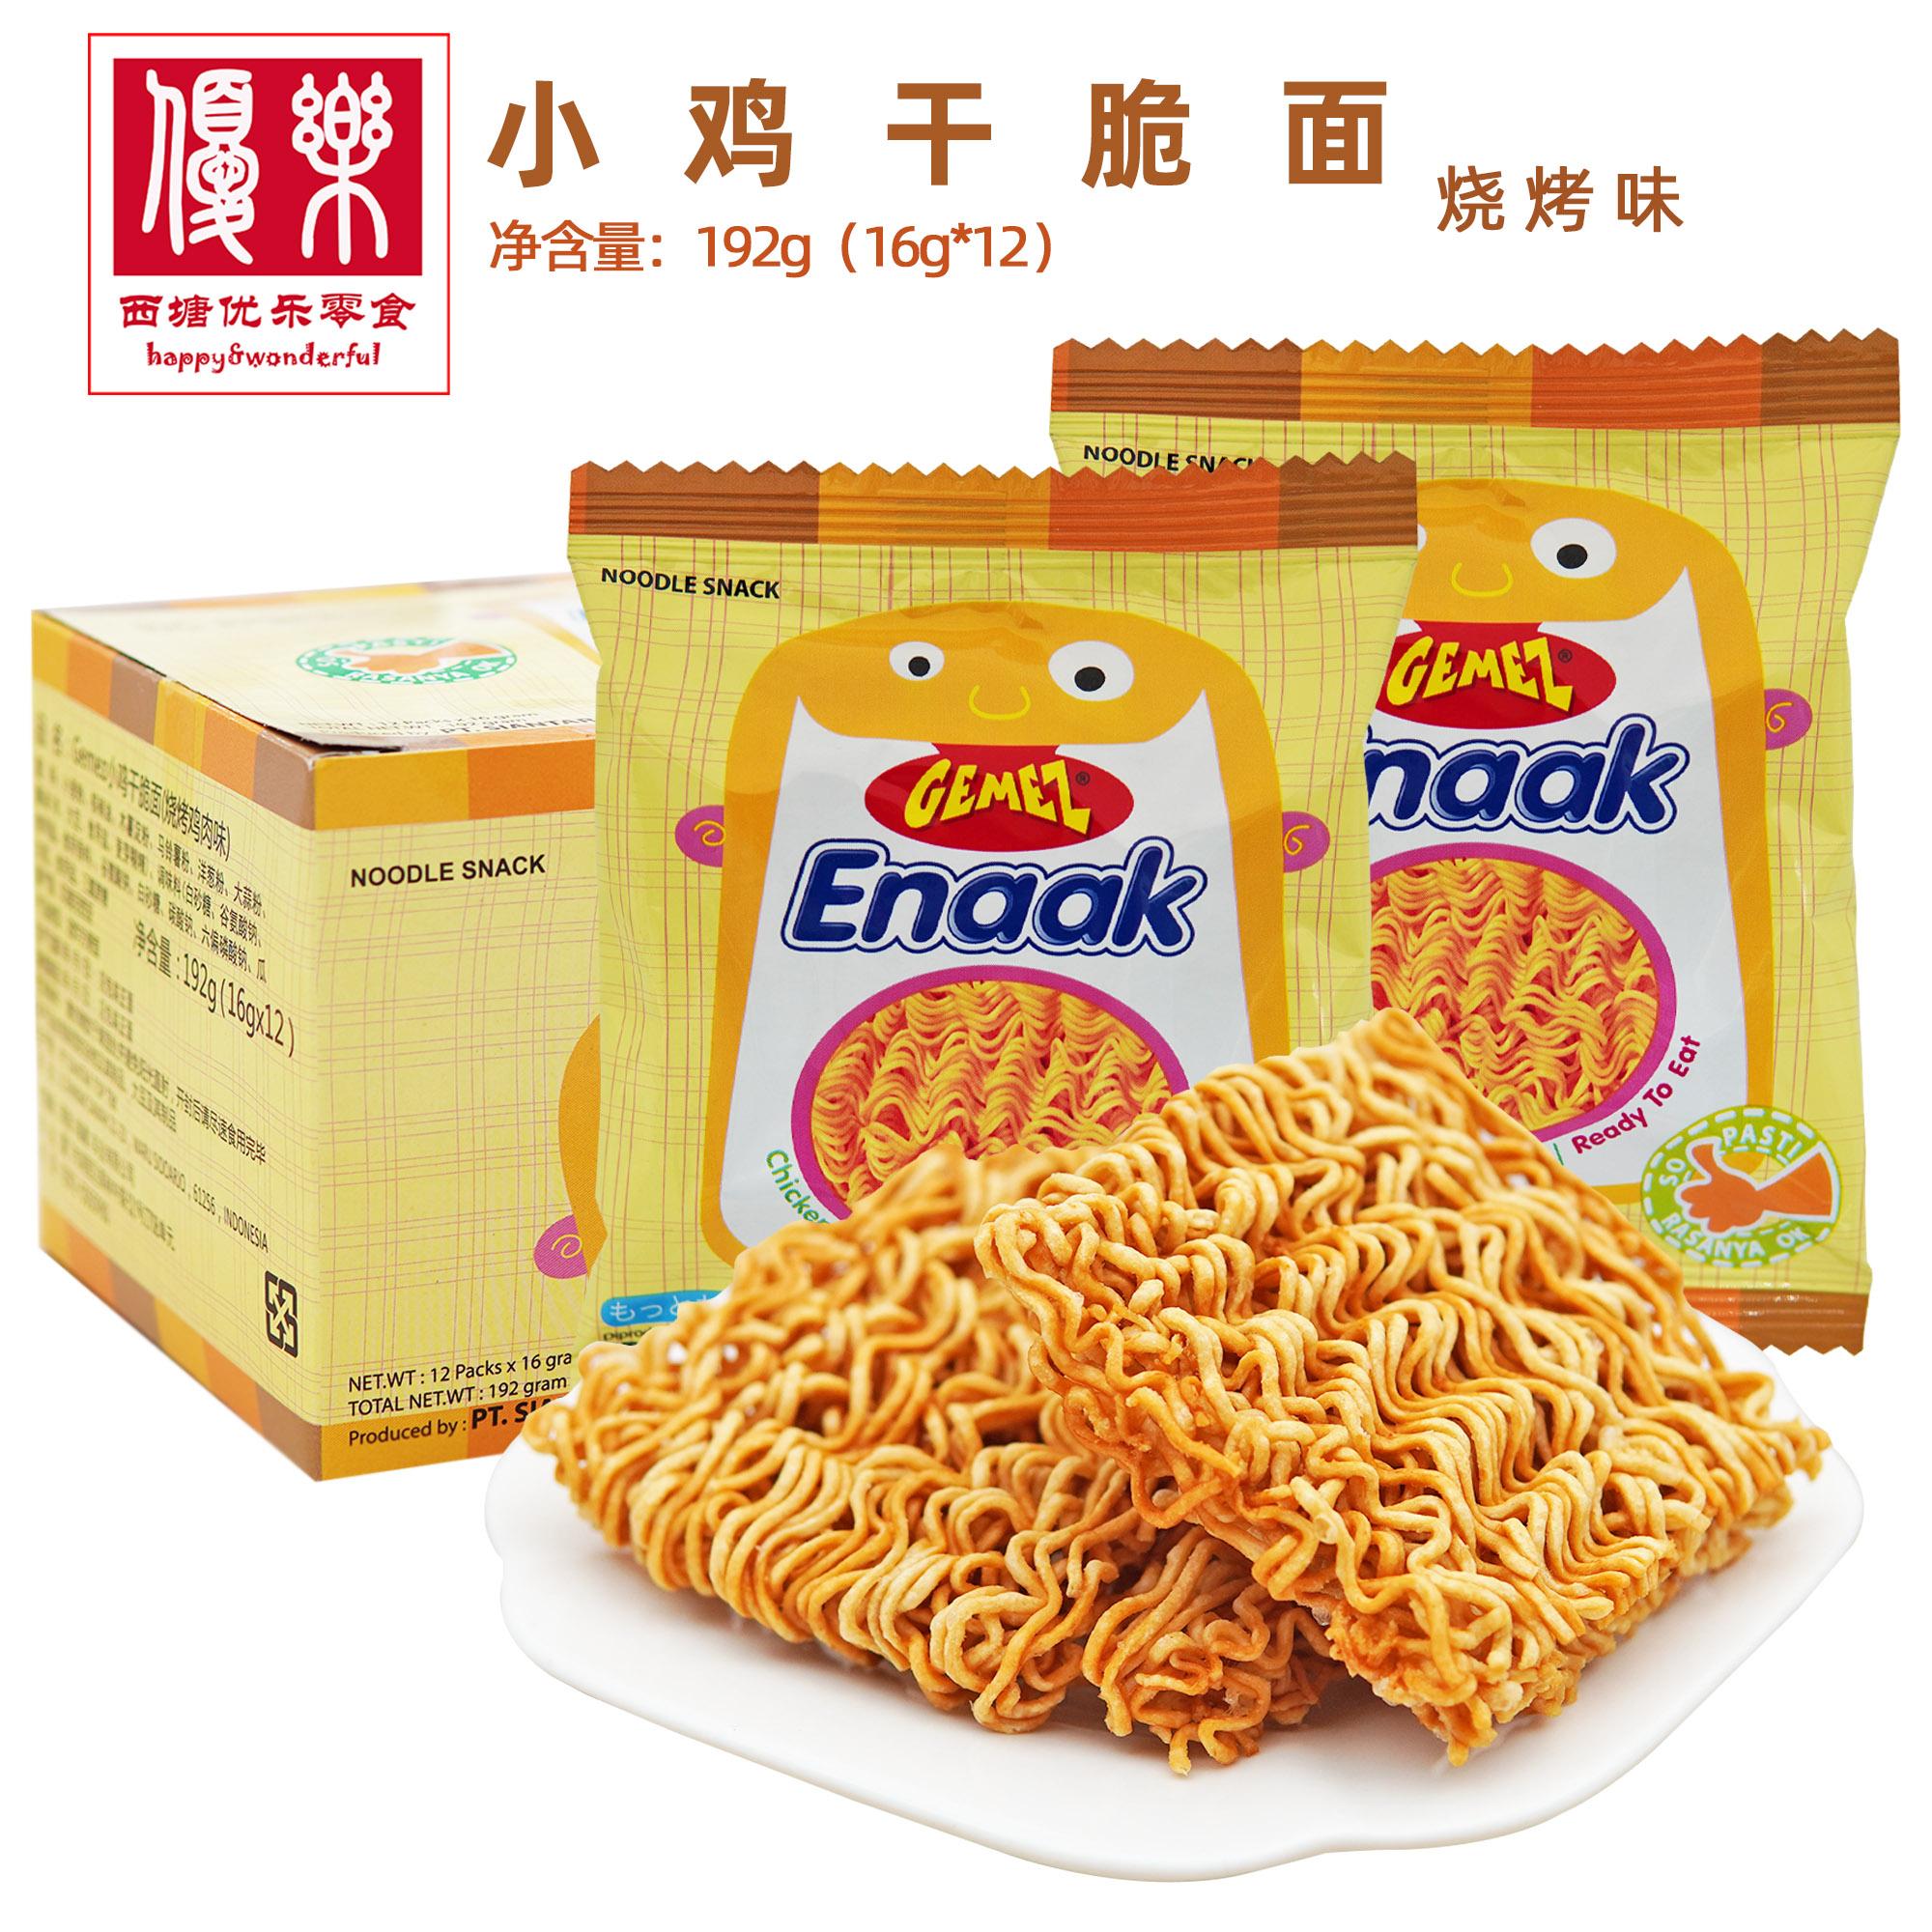 Gemez Enaak小鸡干脆面192g烧烤鸡肉味印尼进口16g12包网红方便面